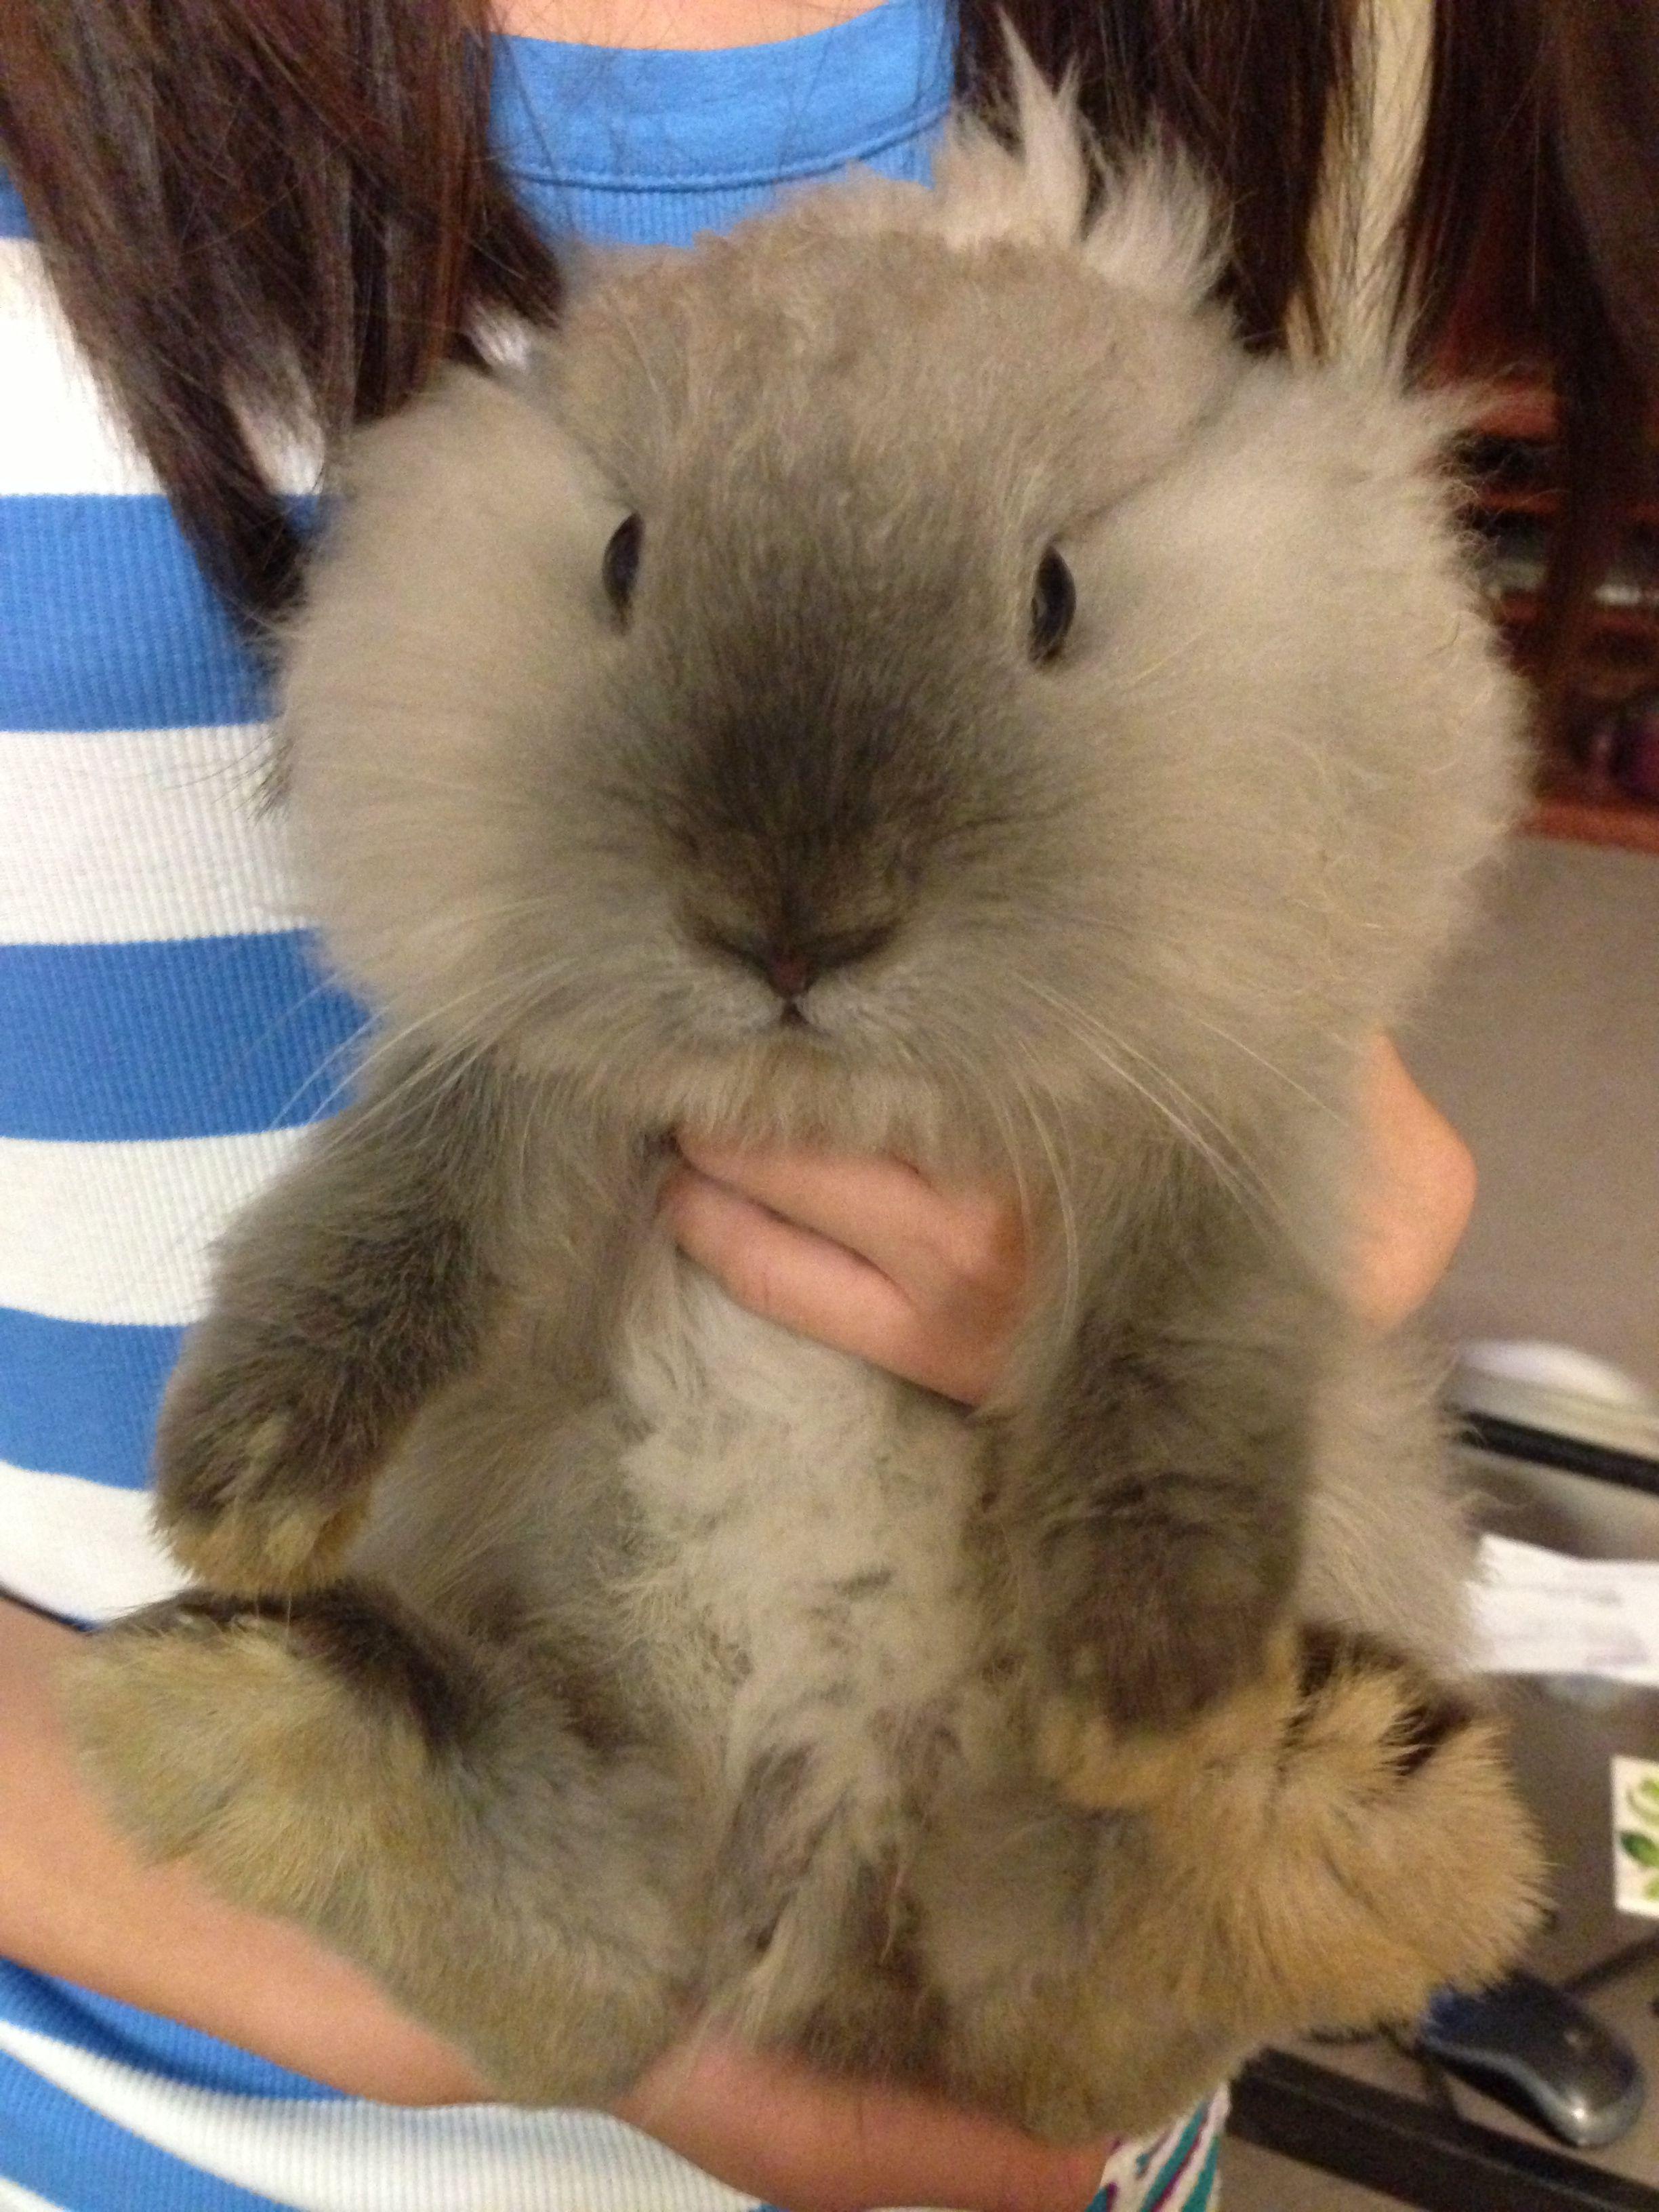 lionhead im in love fluffiest bunny everrrrrr